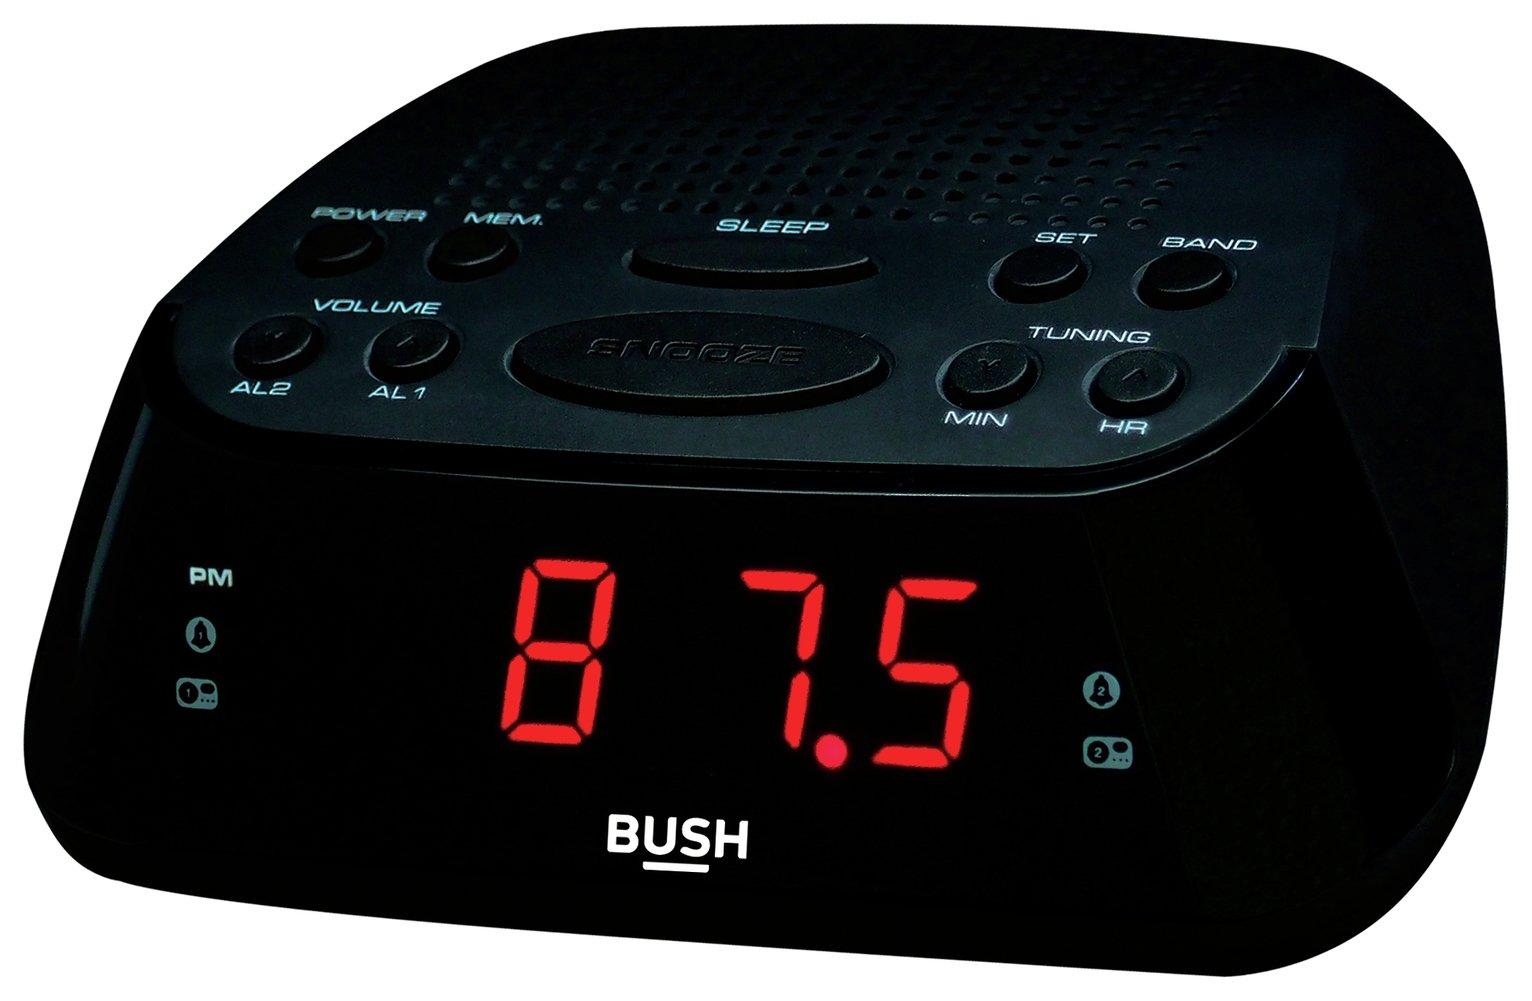 Bush Clock Radio - Black / Silver